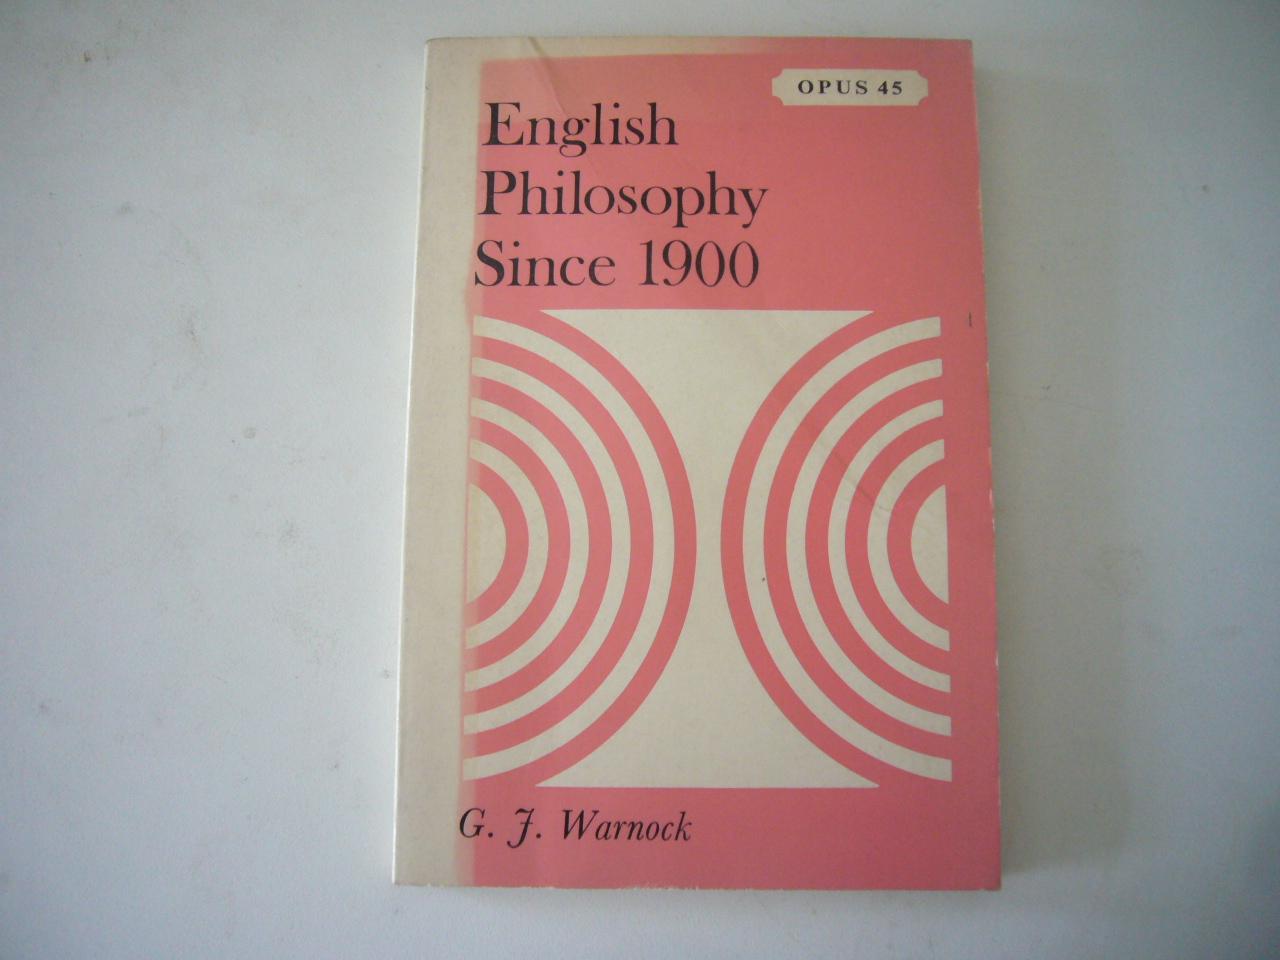 English Philosophy Since 1900